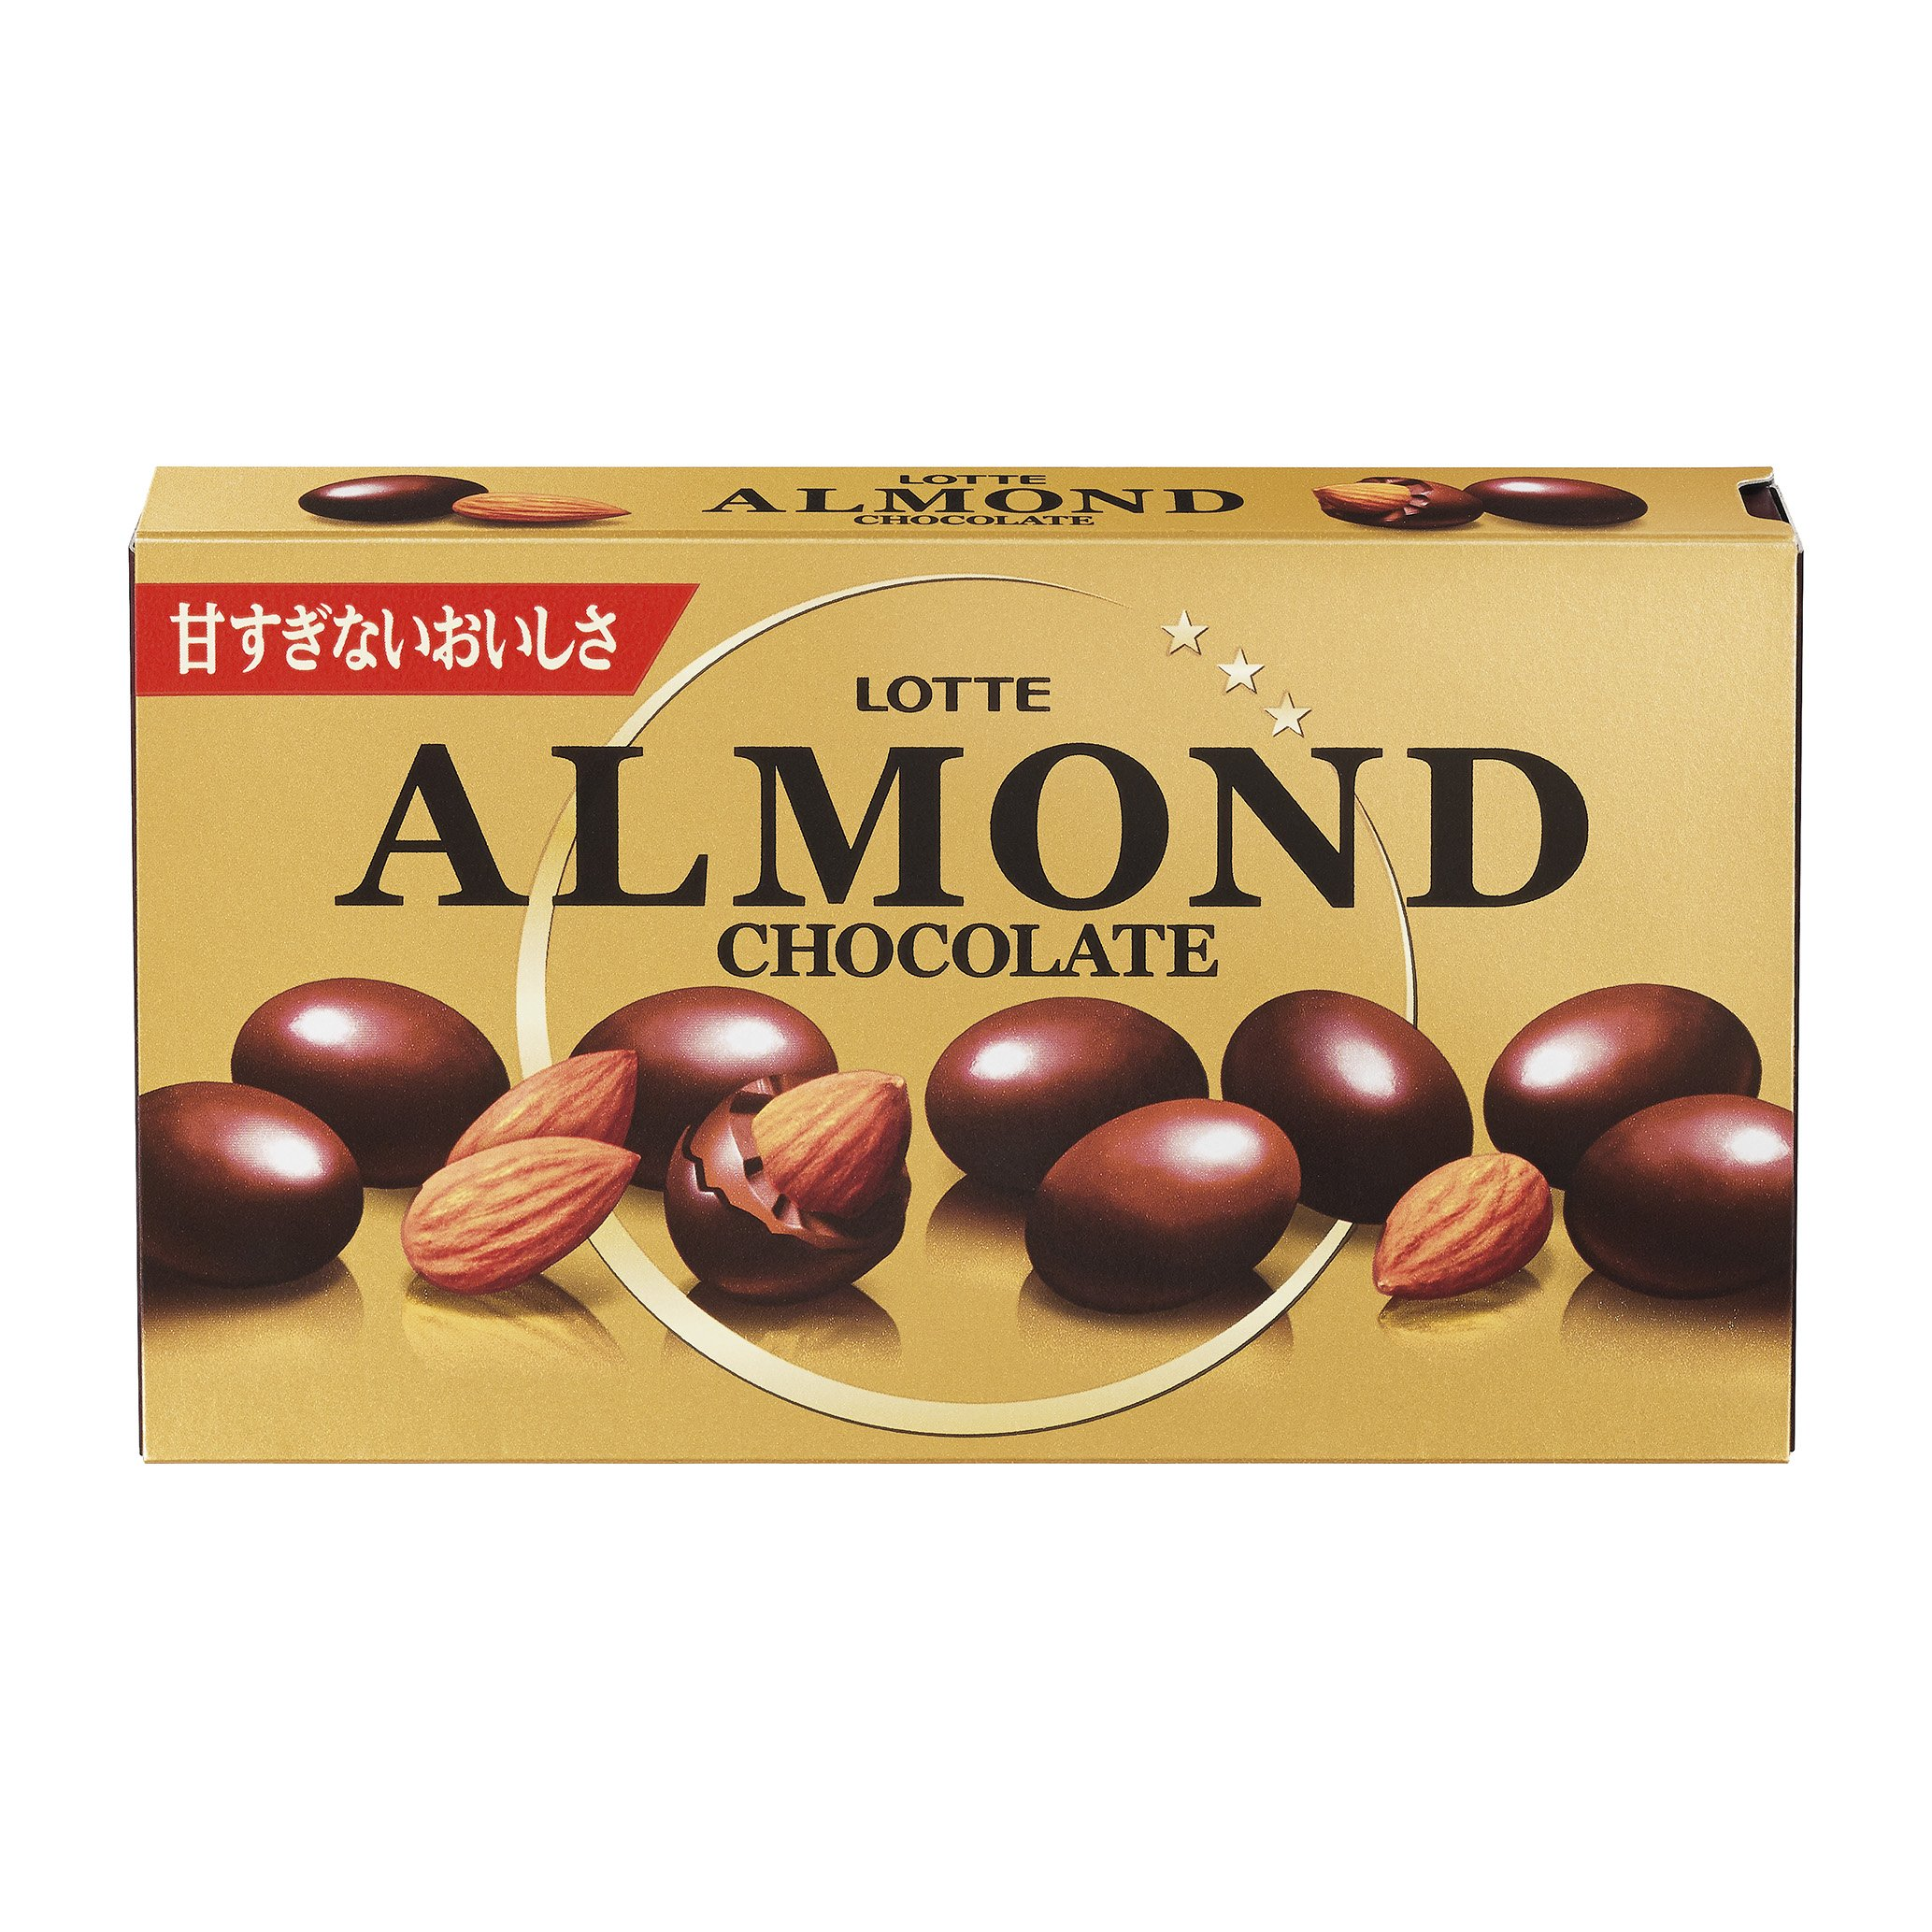 Lotte almond chocolate 86gX10 boxes